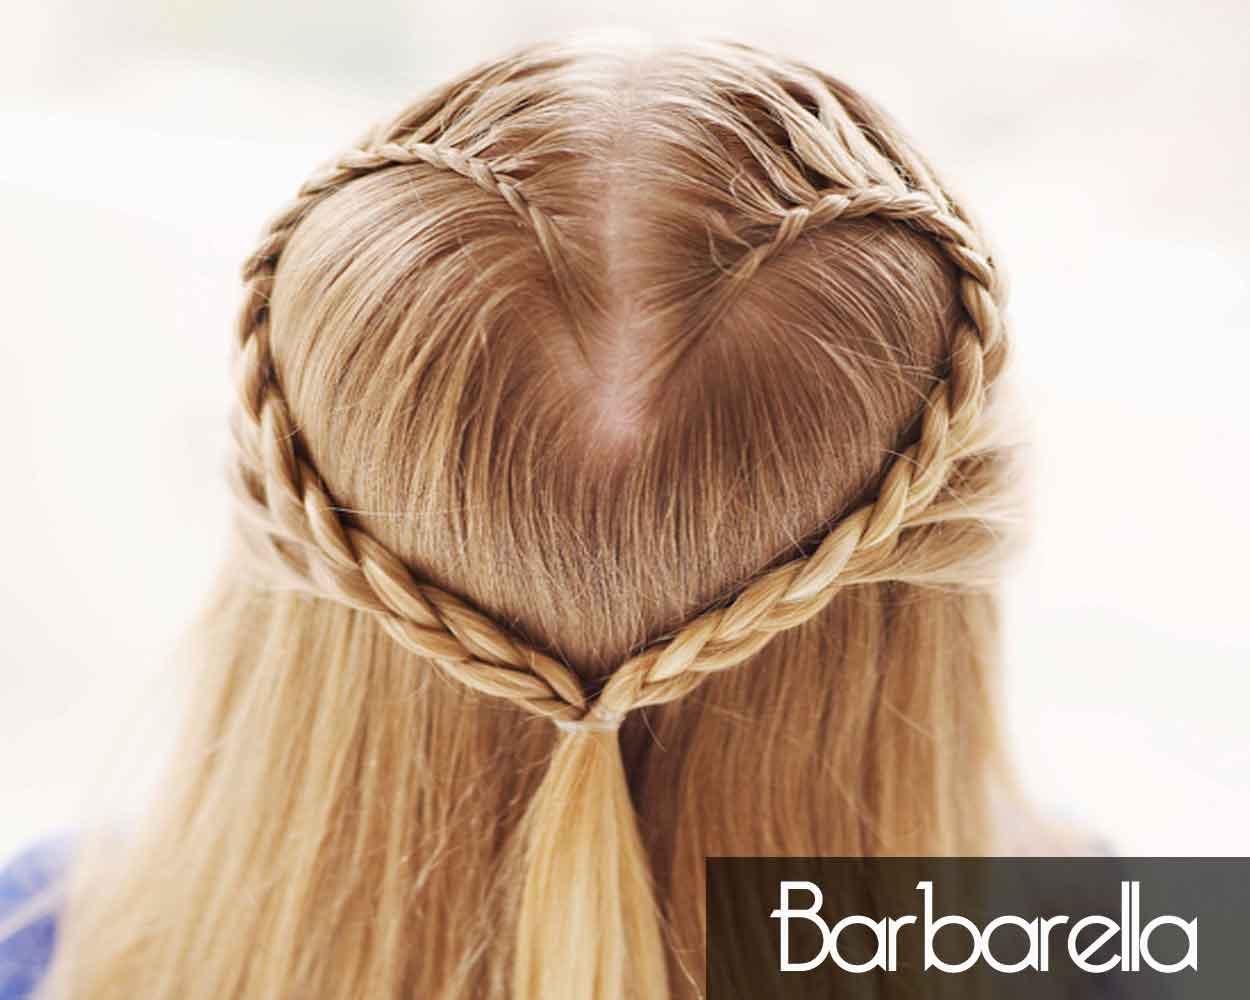 Miraculous A Stunning Braid In 4 Steps Barbarella Hair Schematic Wiring Diagrams Amerangerunnerswayorg